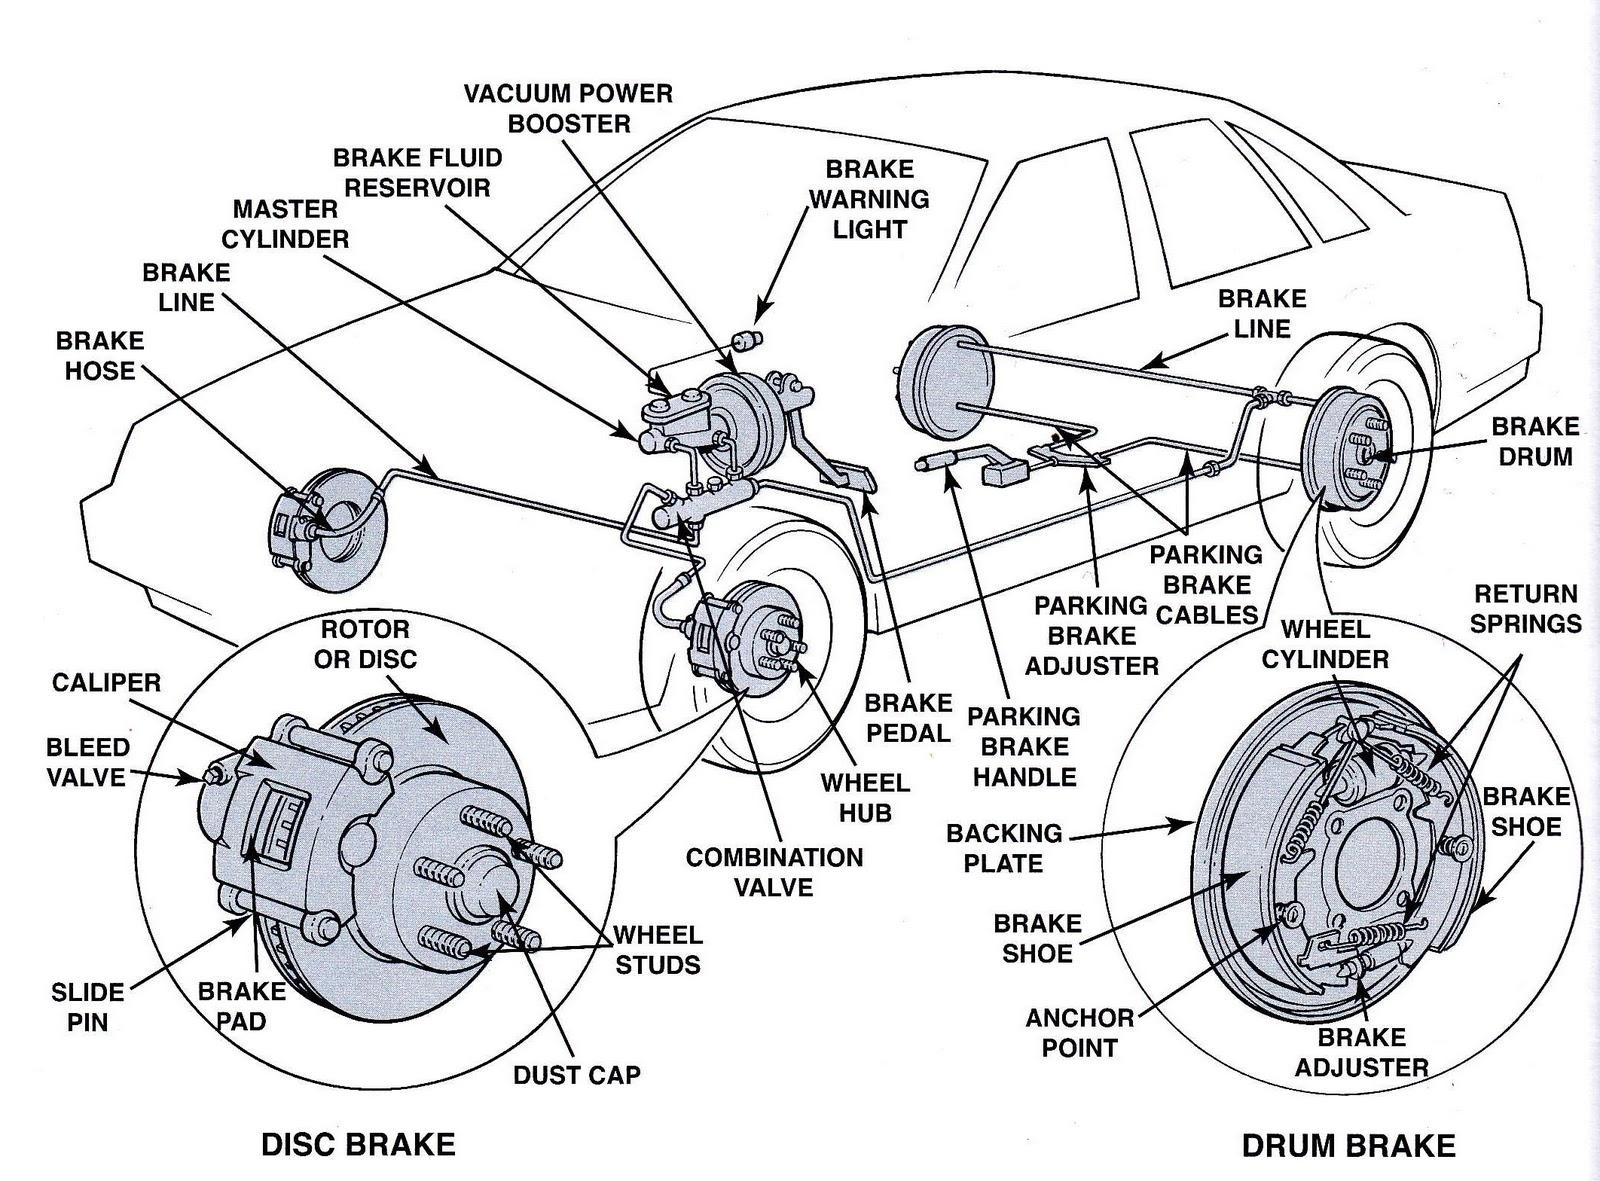 front brake components parts diagram car parts diagram car tuning